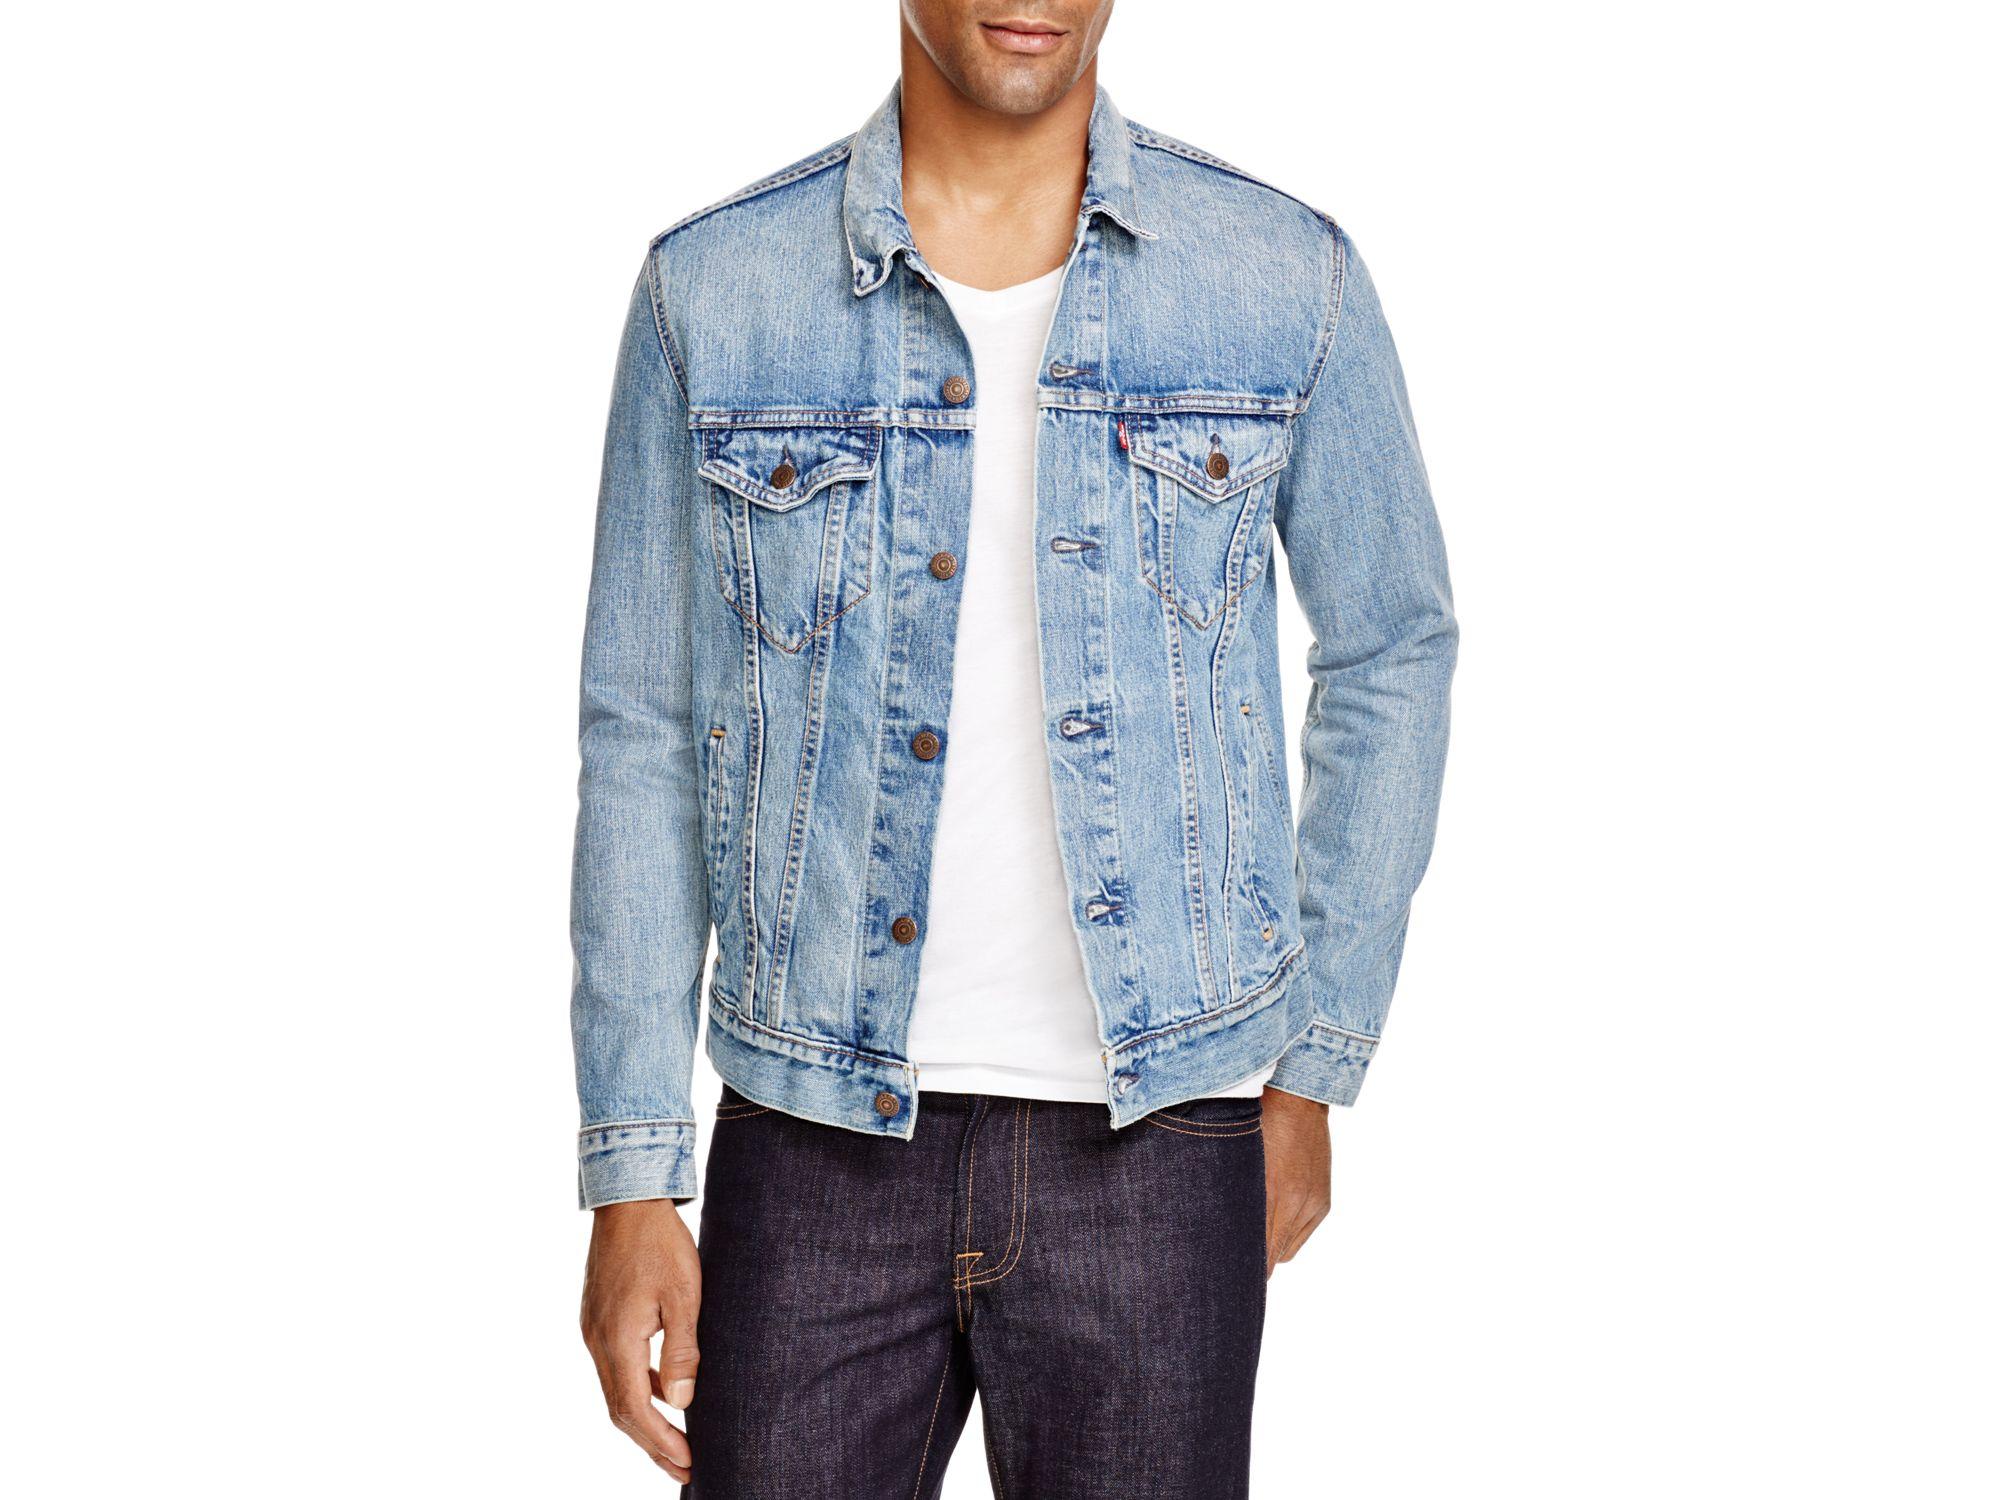 aa5b0de1fef61 Inexpensive denim jackets : malefashionadvice